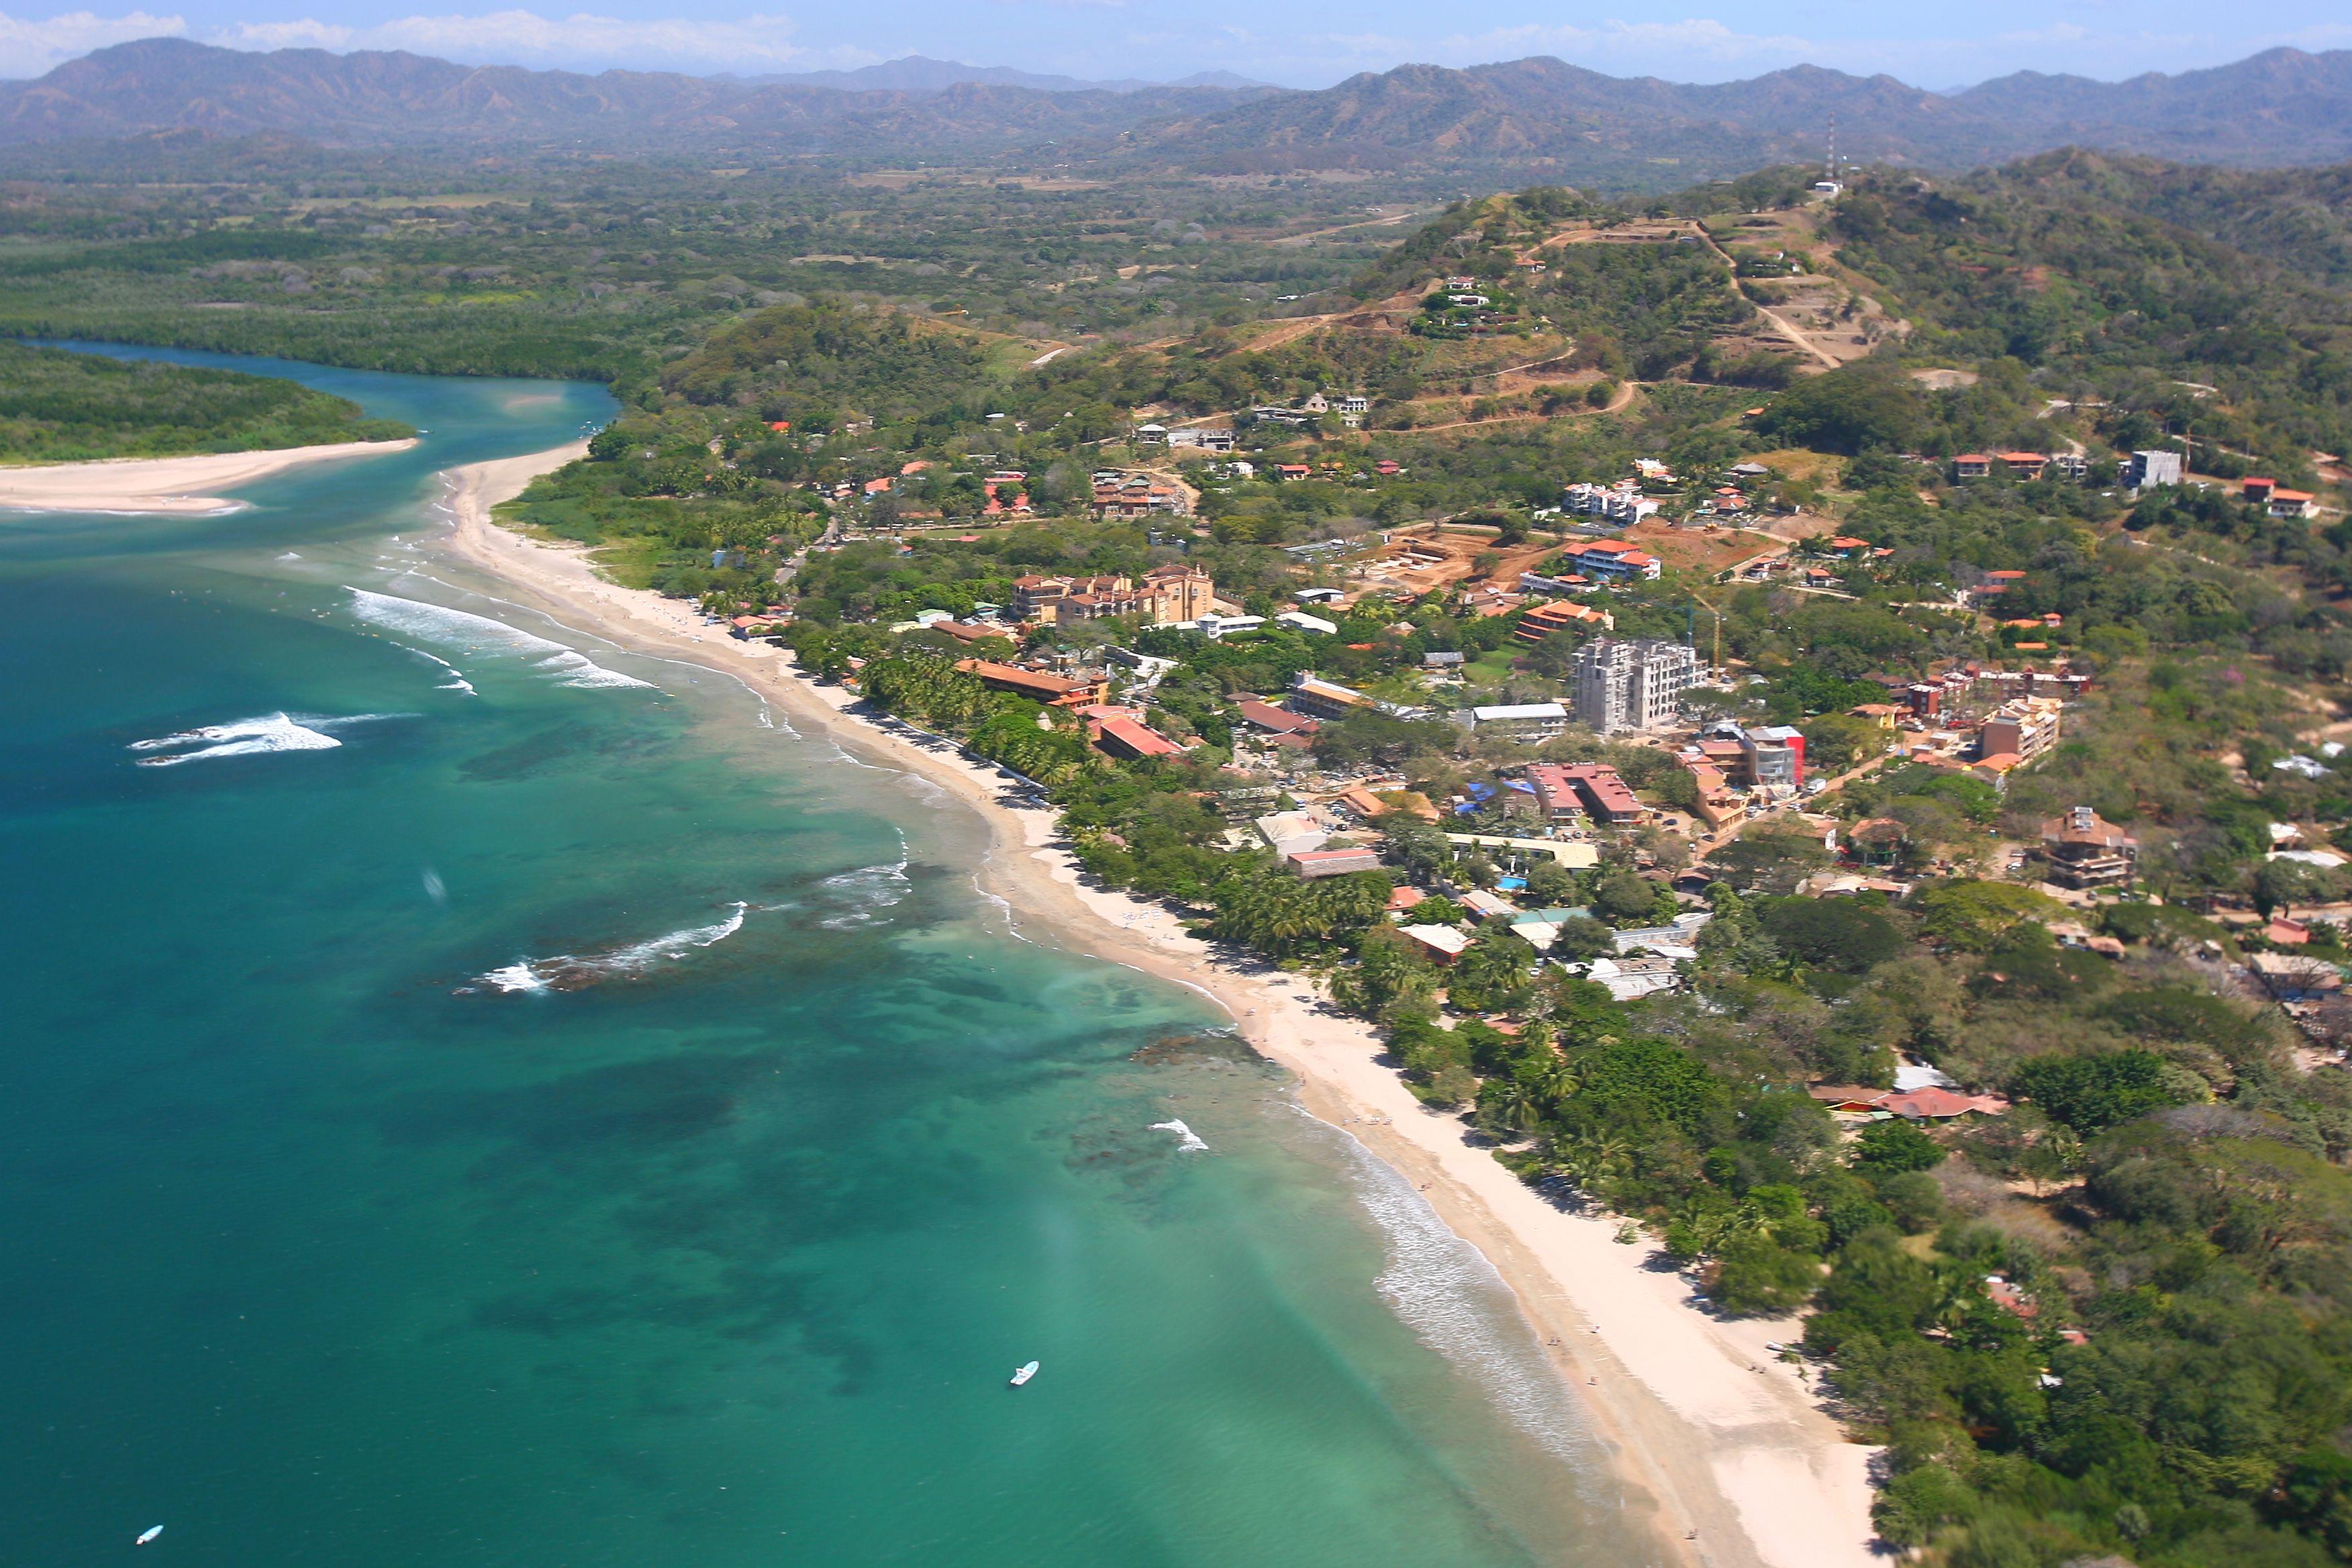 20 good news stories 2016 costa rica runs on renewable energy